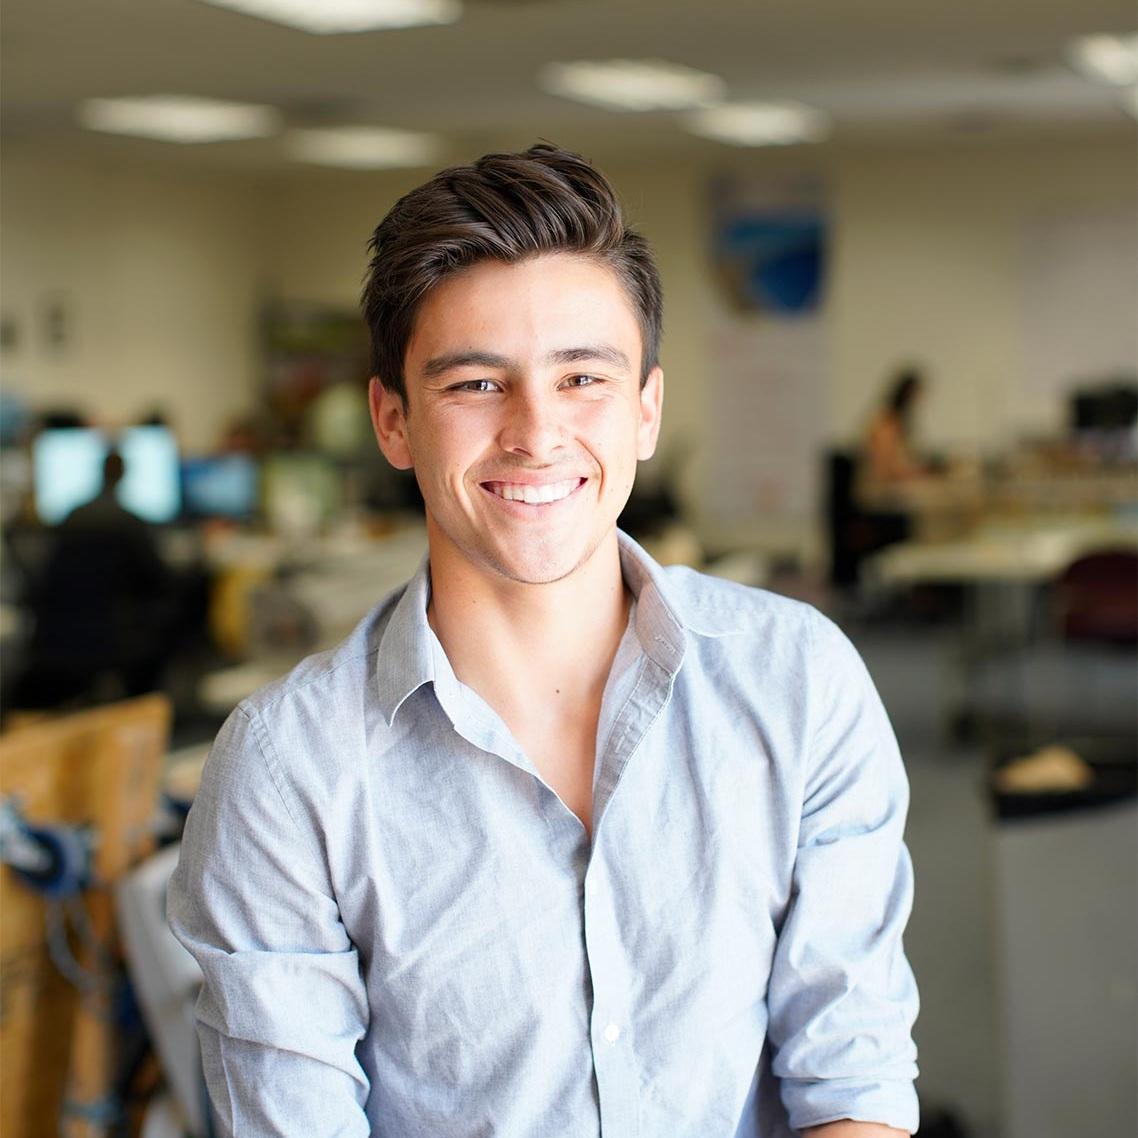 Jason Hustad - Mechanical Engineering Intern